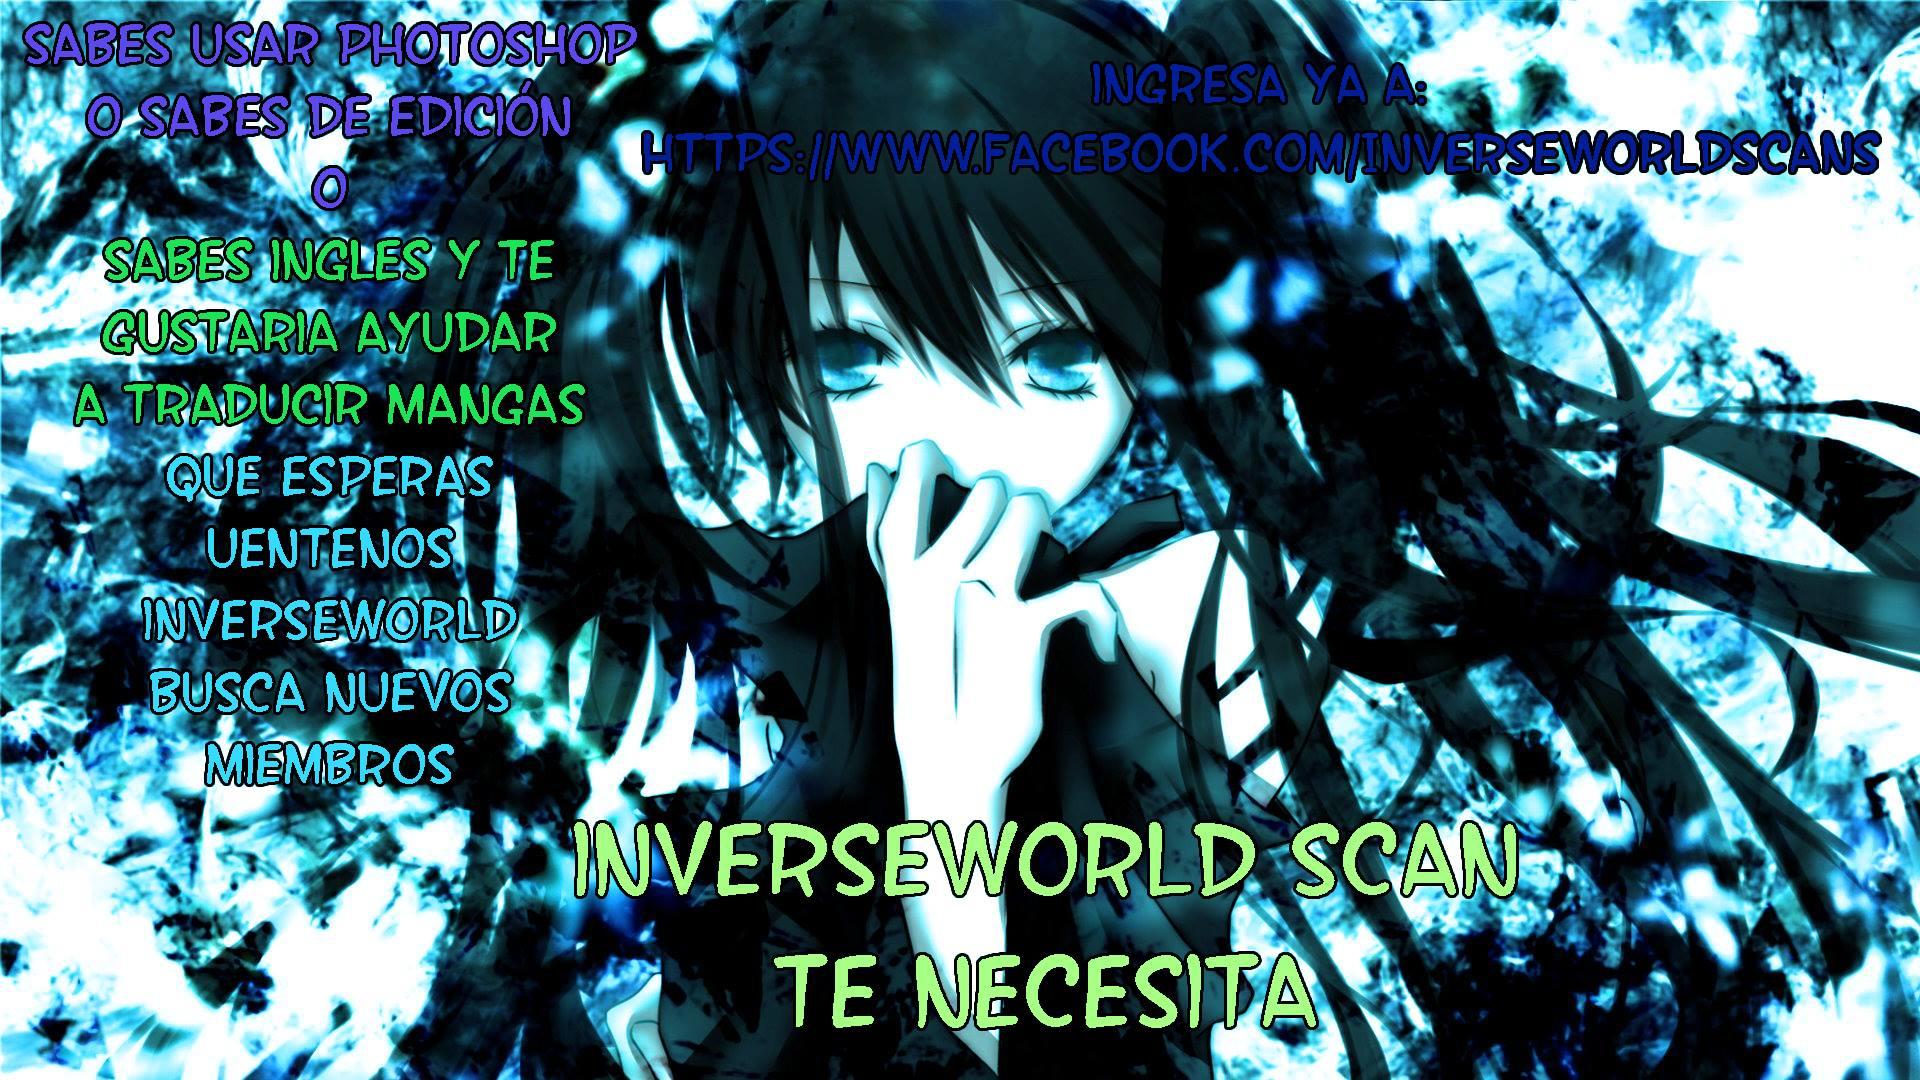 http://c5.ninemanga.com/es_manga/18/16210/415334/ef0eff6088e2ed94f6caf720239f40d5.jpg Page 1